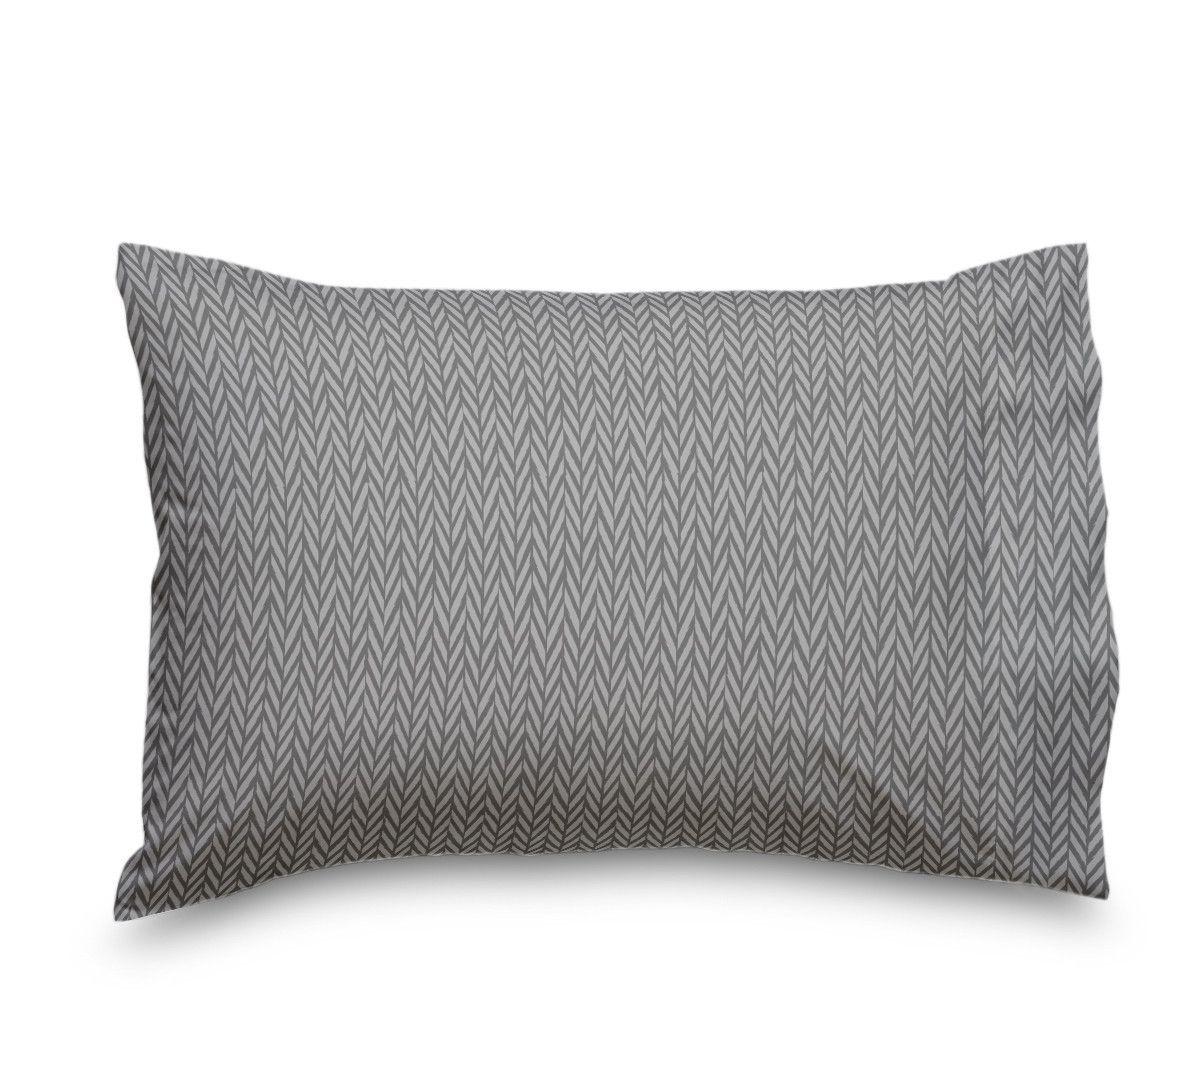 Grey Herringbone Double Brushed Microfiber Duvet Cover